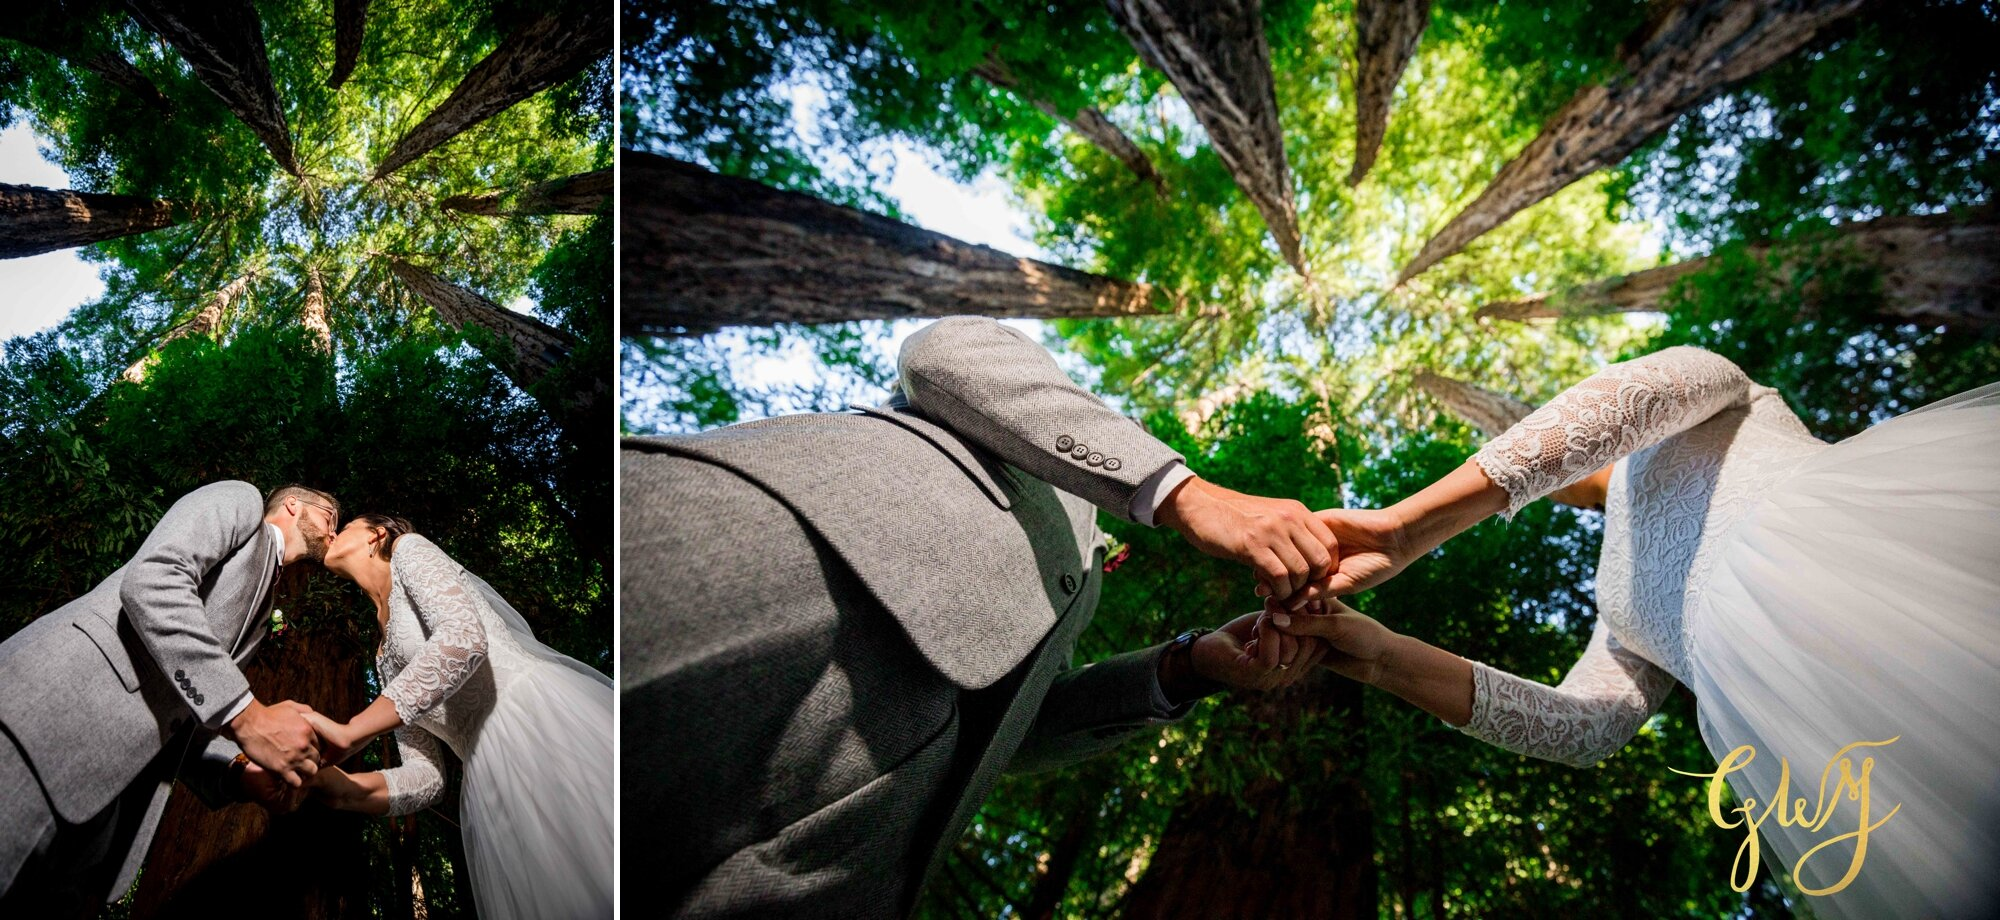 Casey + Jordan's Intimate Big Sur Elopement in the Redwoods by Glass Woods Media - 2 6.jpg